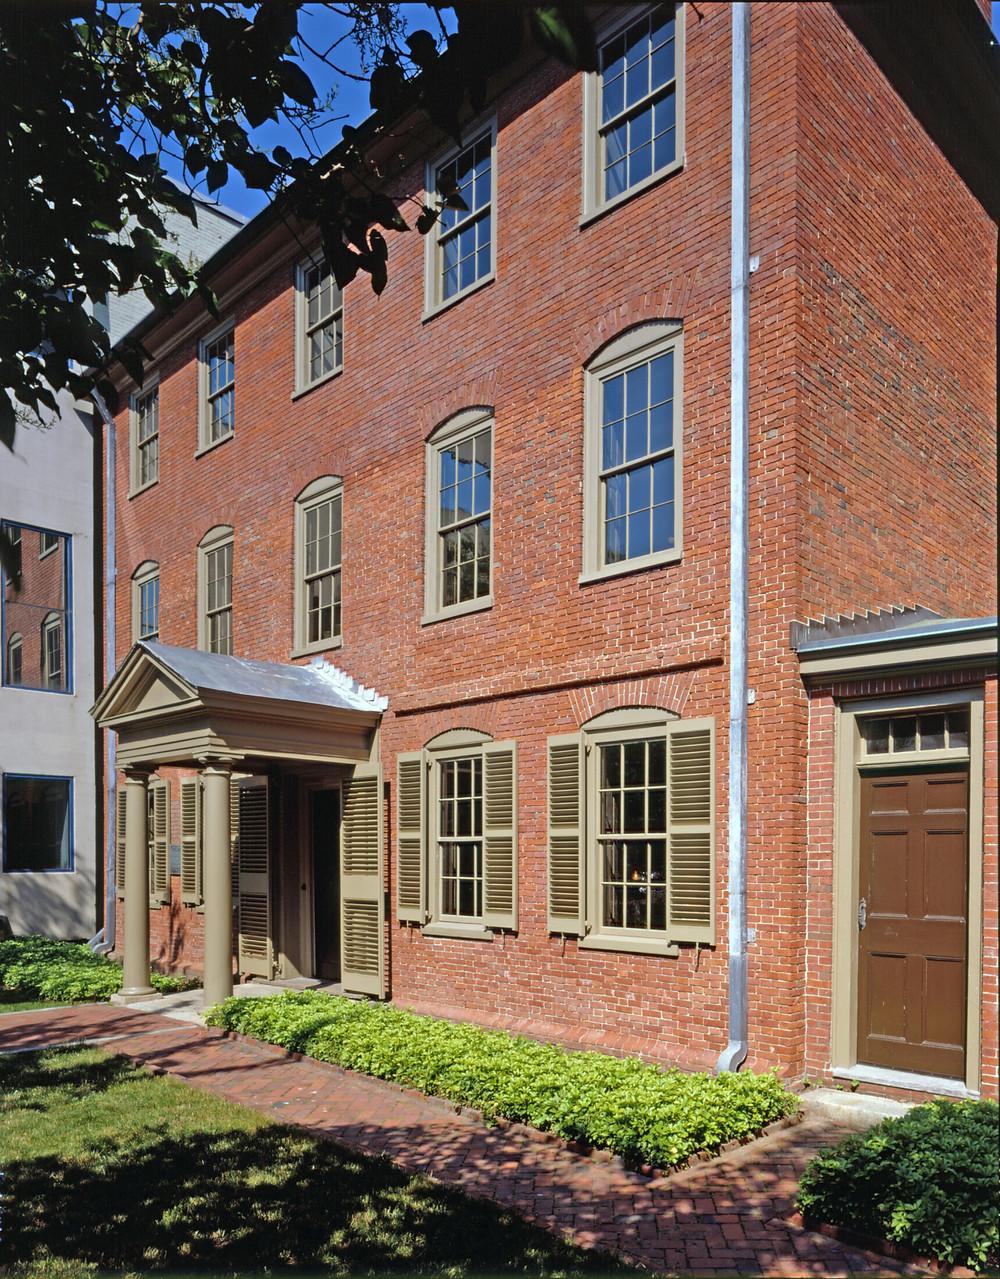 Henry Wadsworth Longfellow House